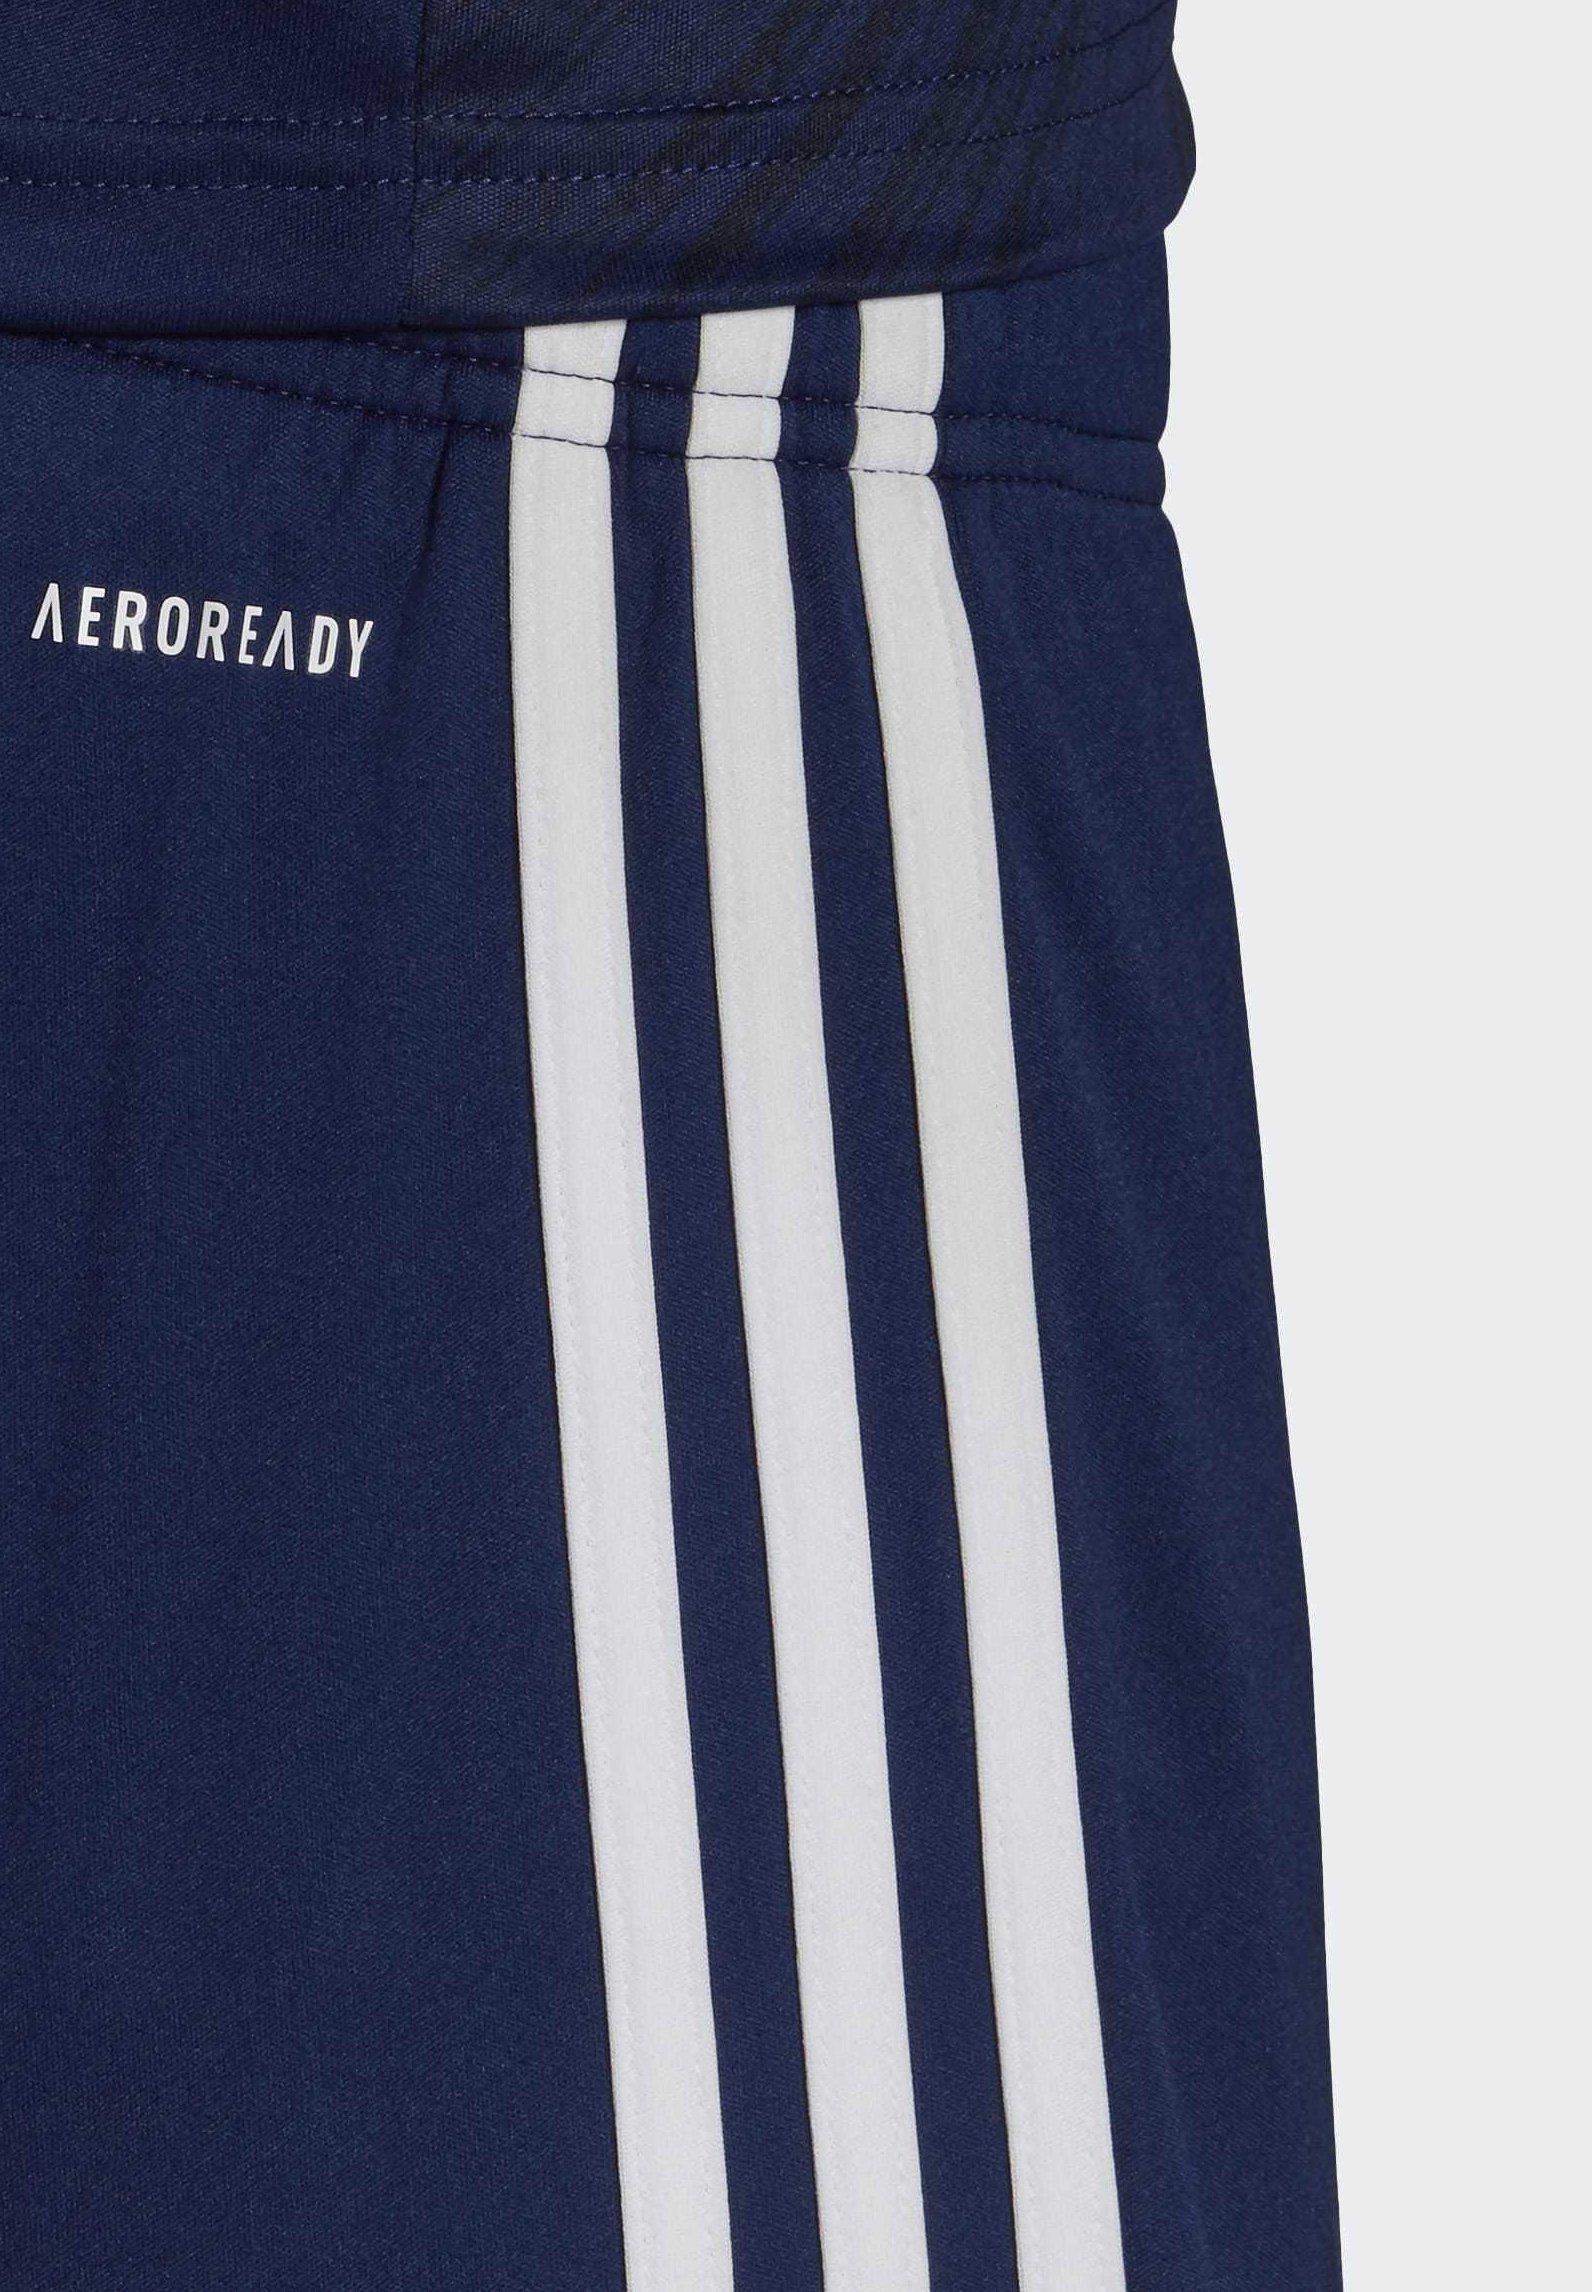 Adidas Performance Fc Girondins De Bordeaux - Krótkie Spodenki Sportowe Blue